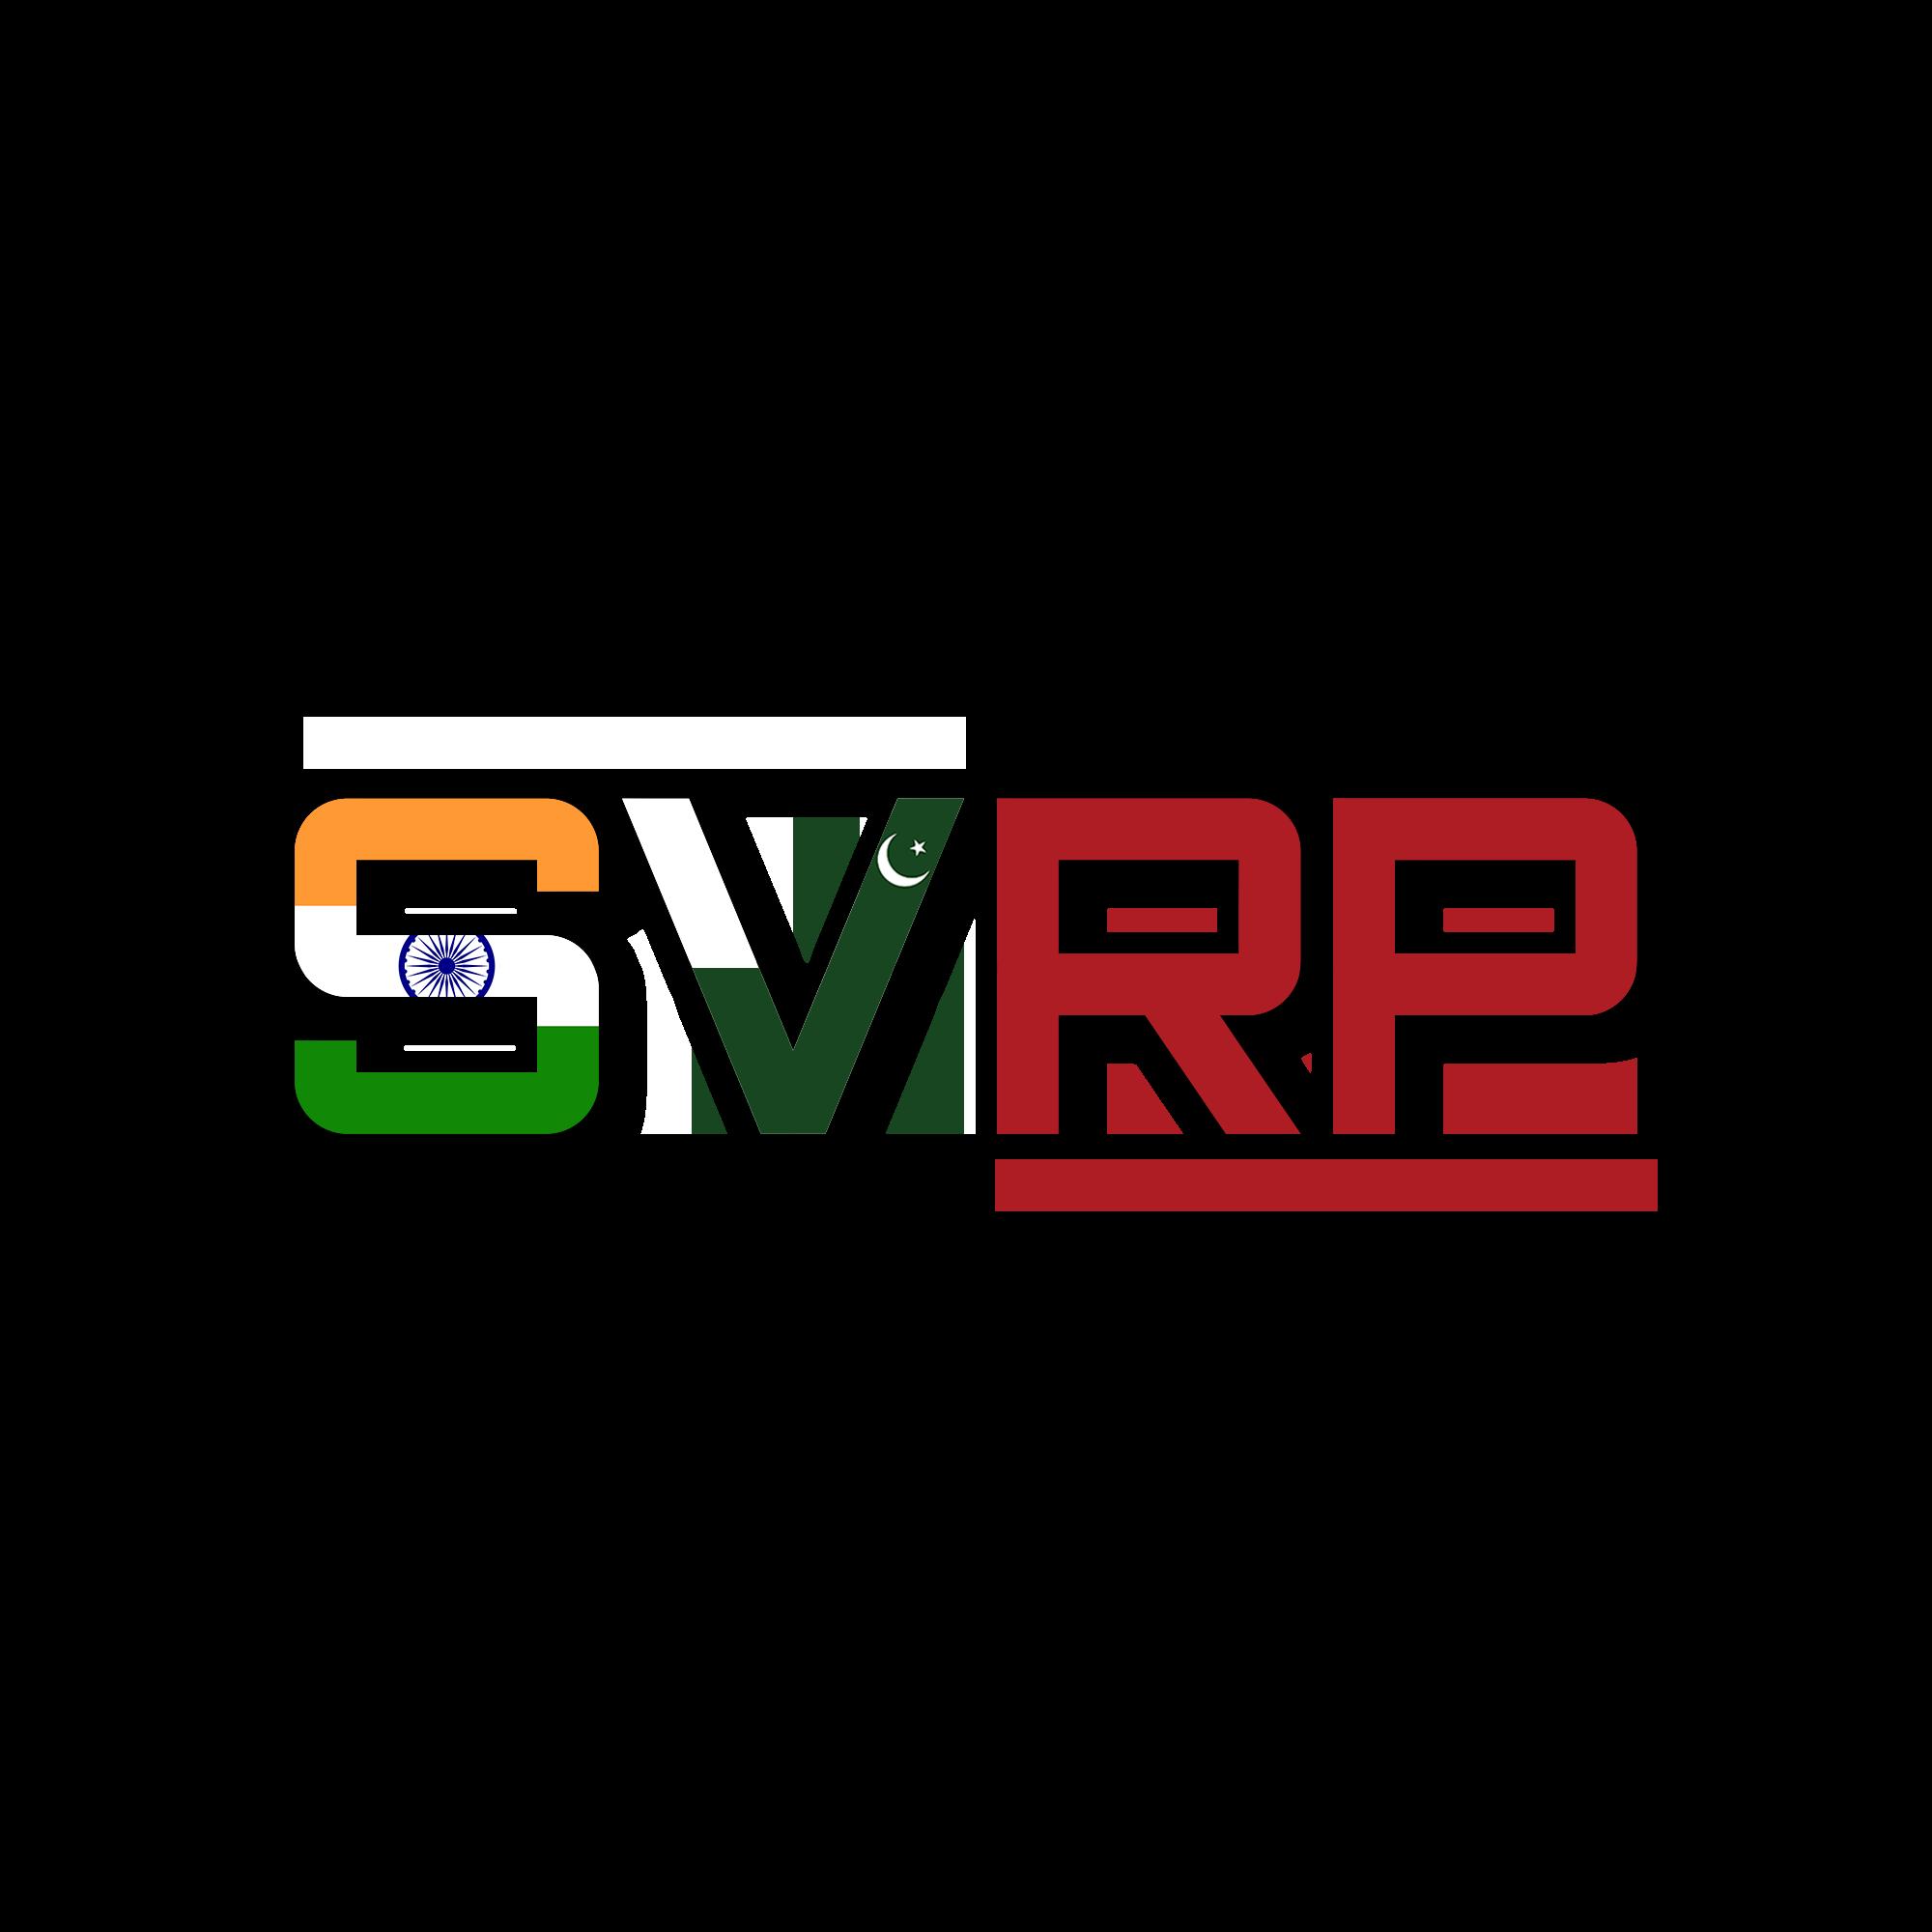 Subversion RP India